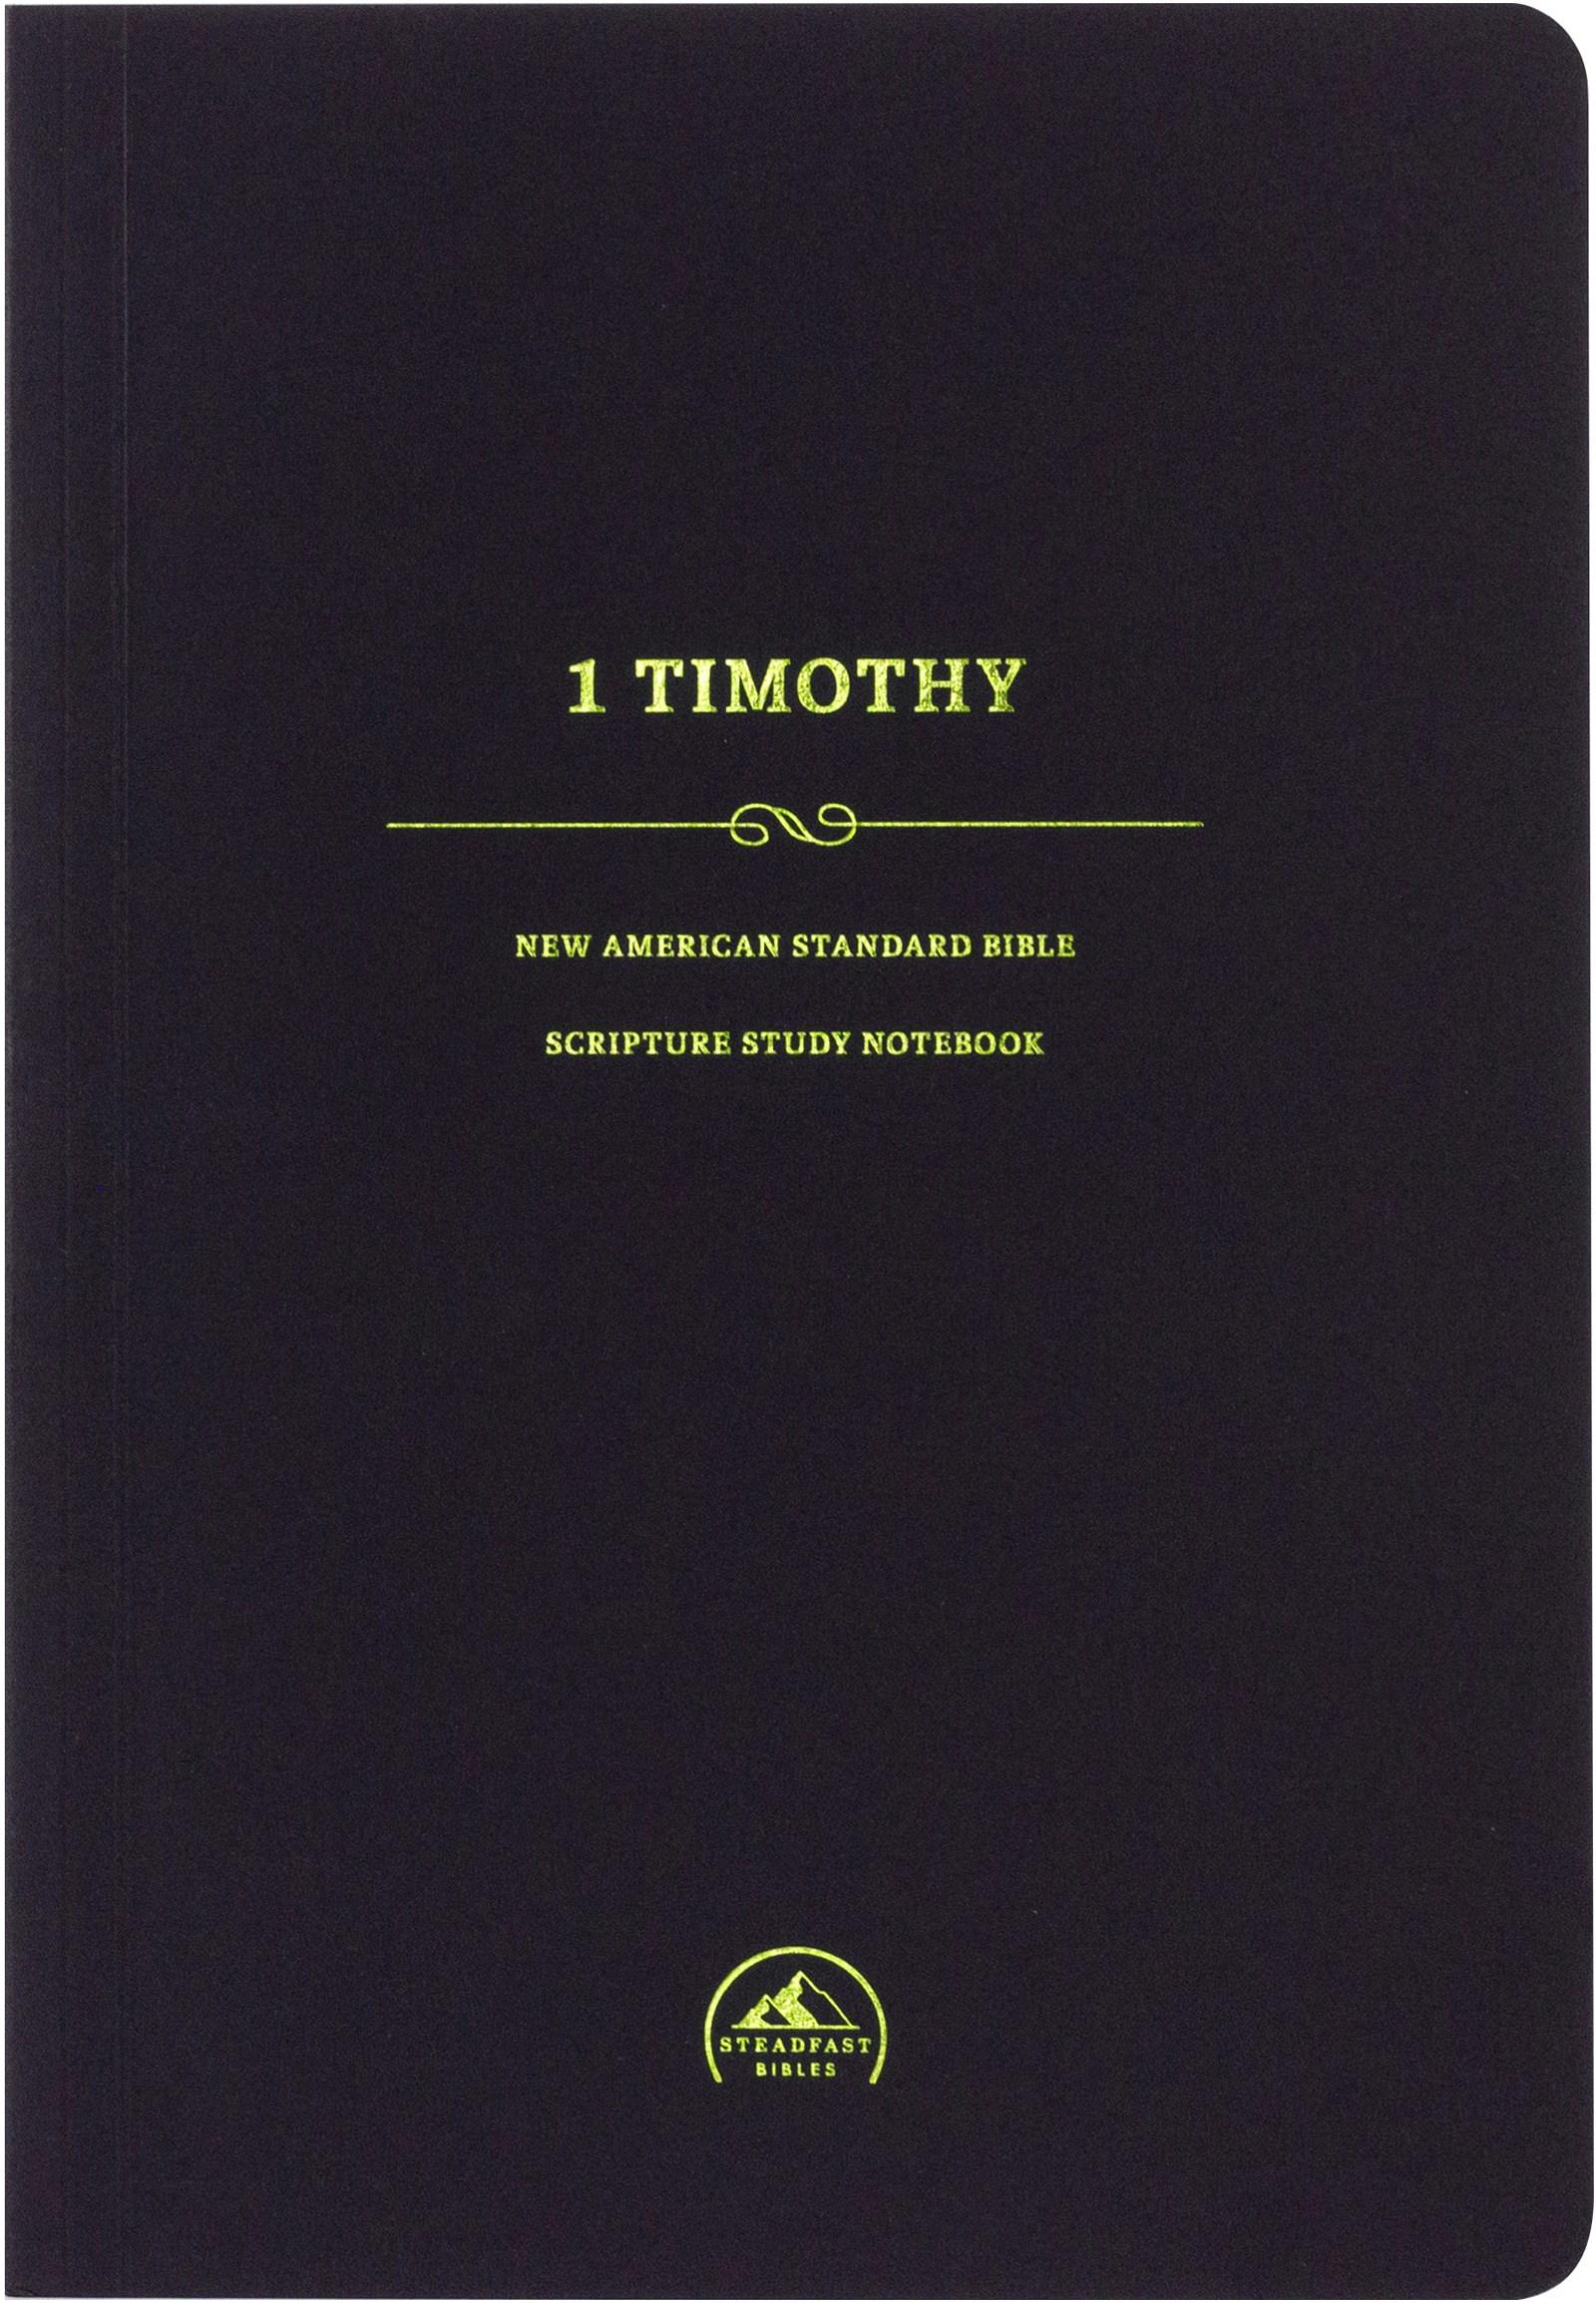 NASB Scripture Study Notebook: 1 Timothy